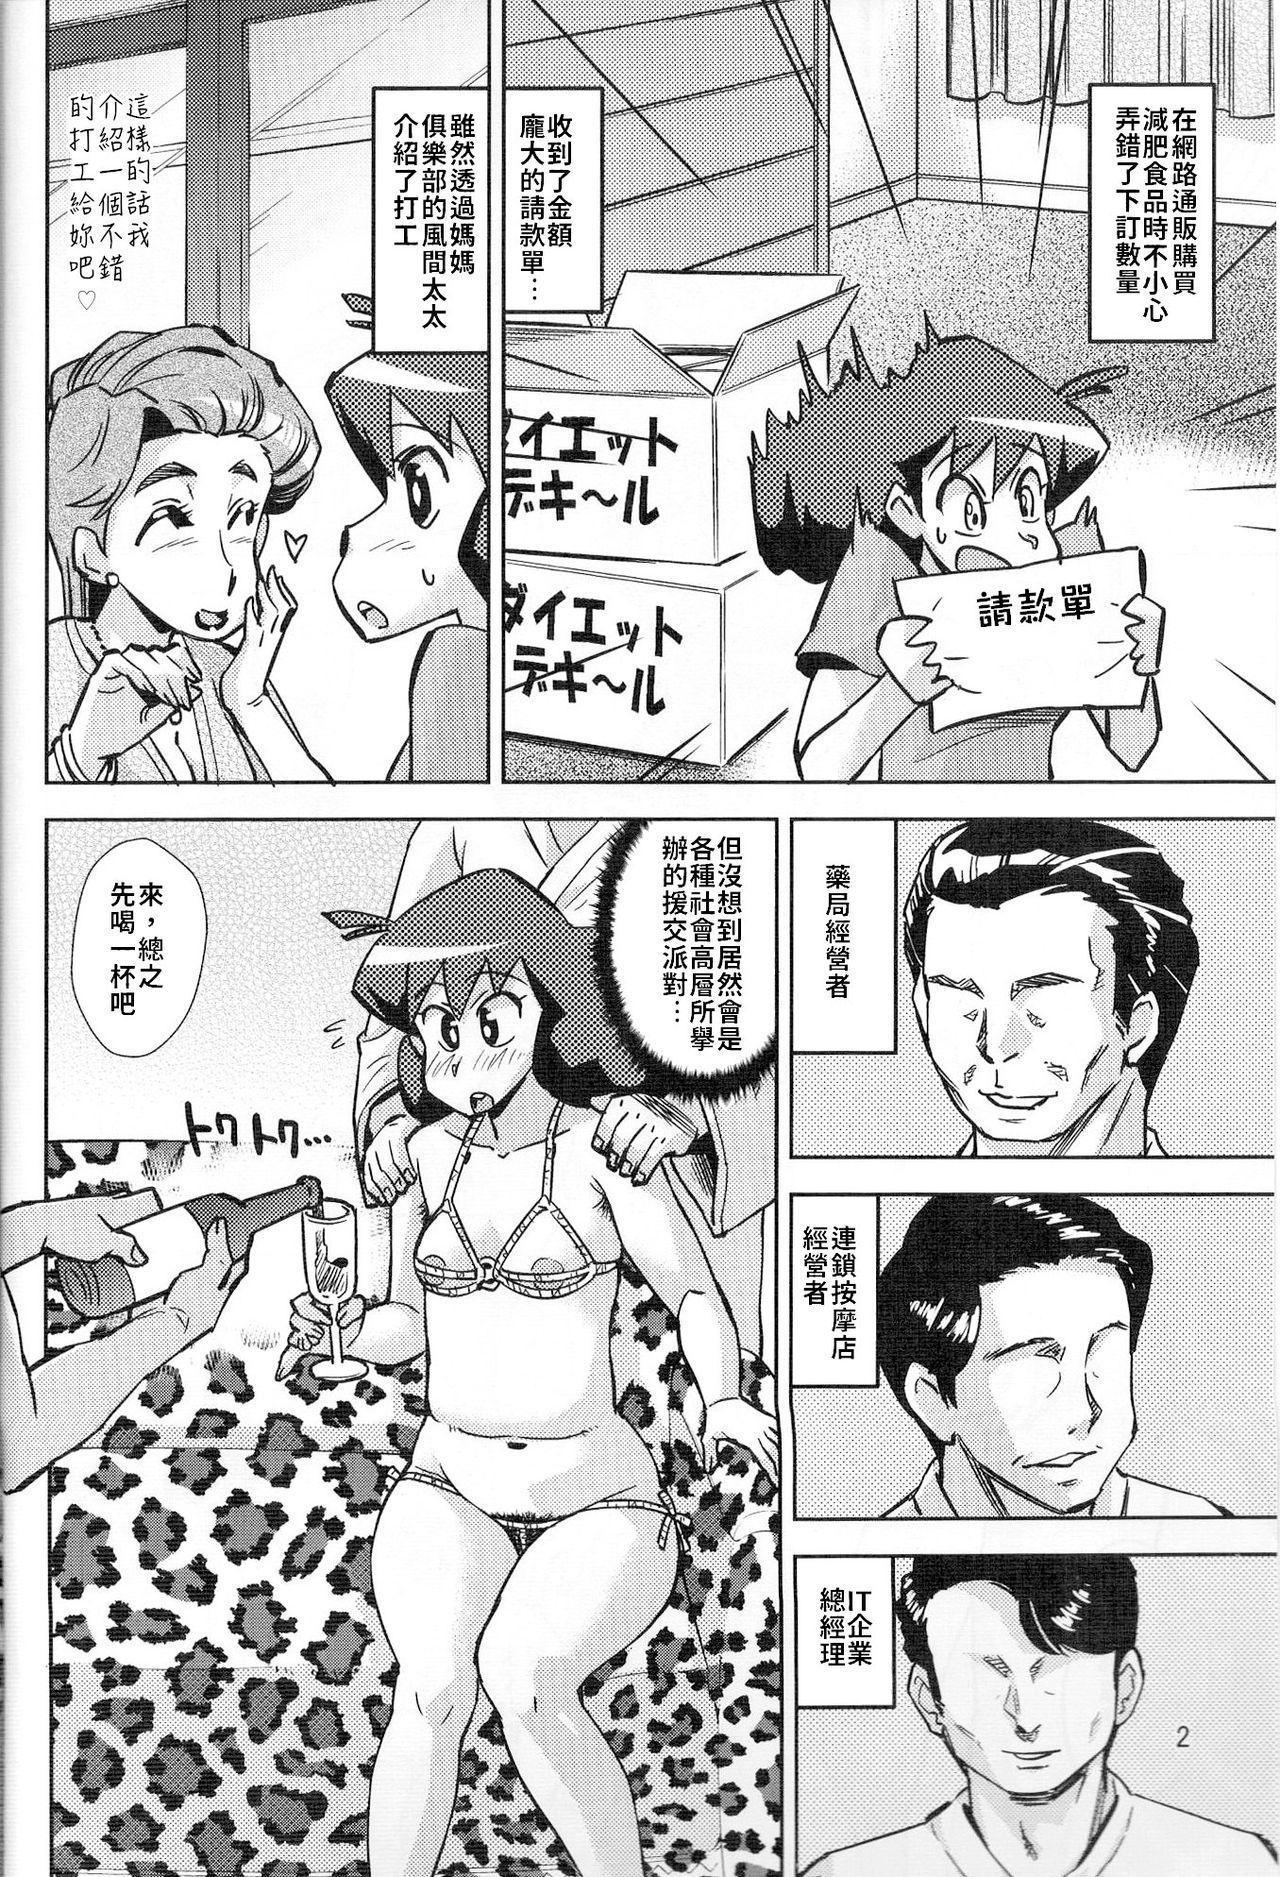 Misae to Mineko no Enkou de Rankou    美冴和峰子的援交~淫亂盛宴~ 3